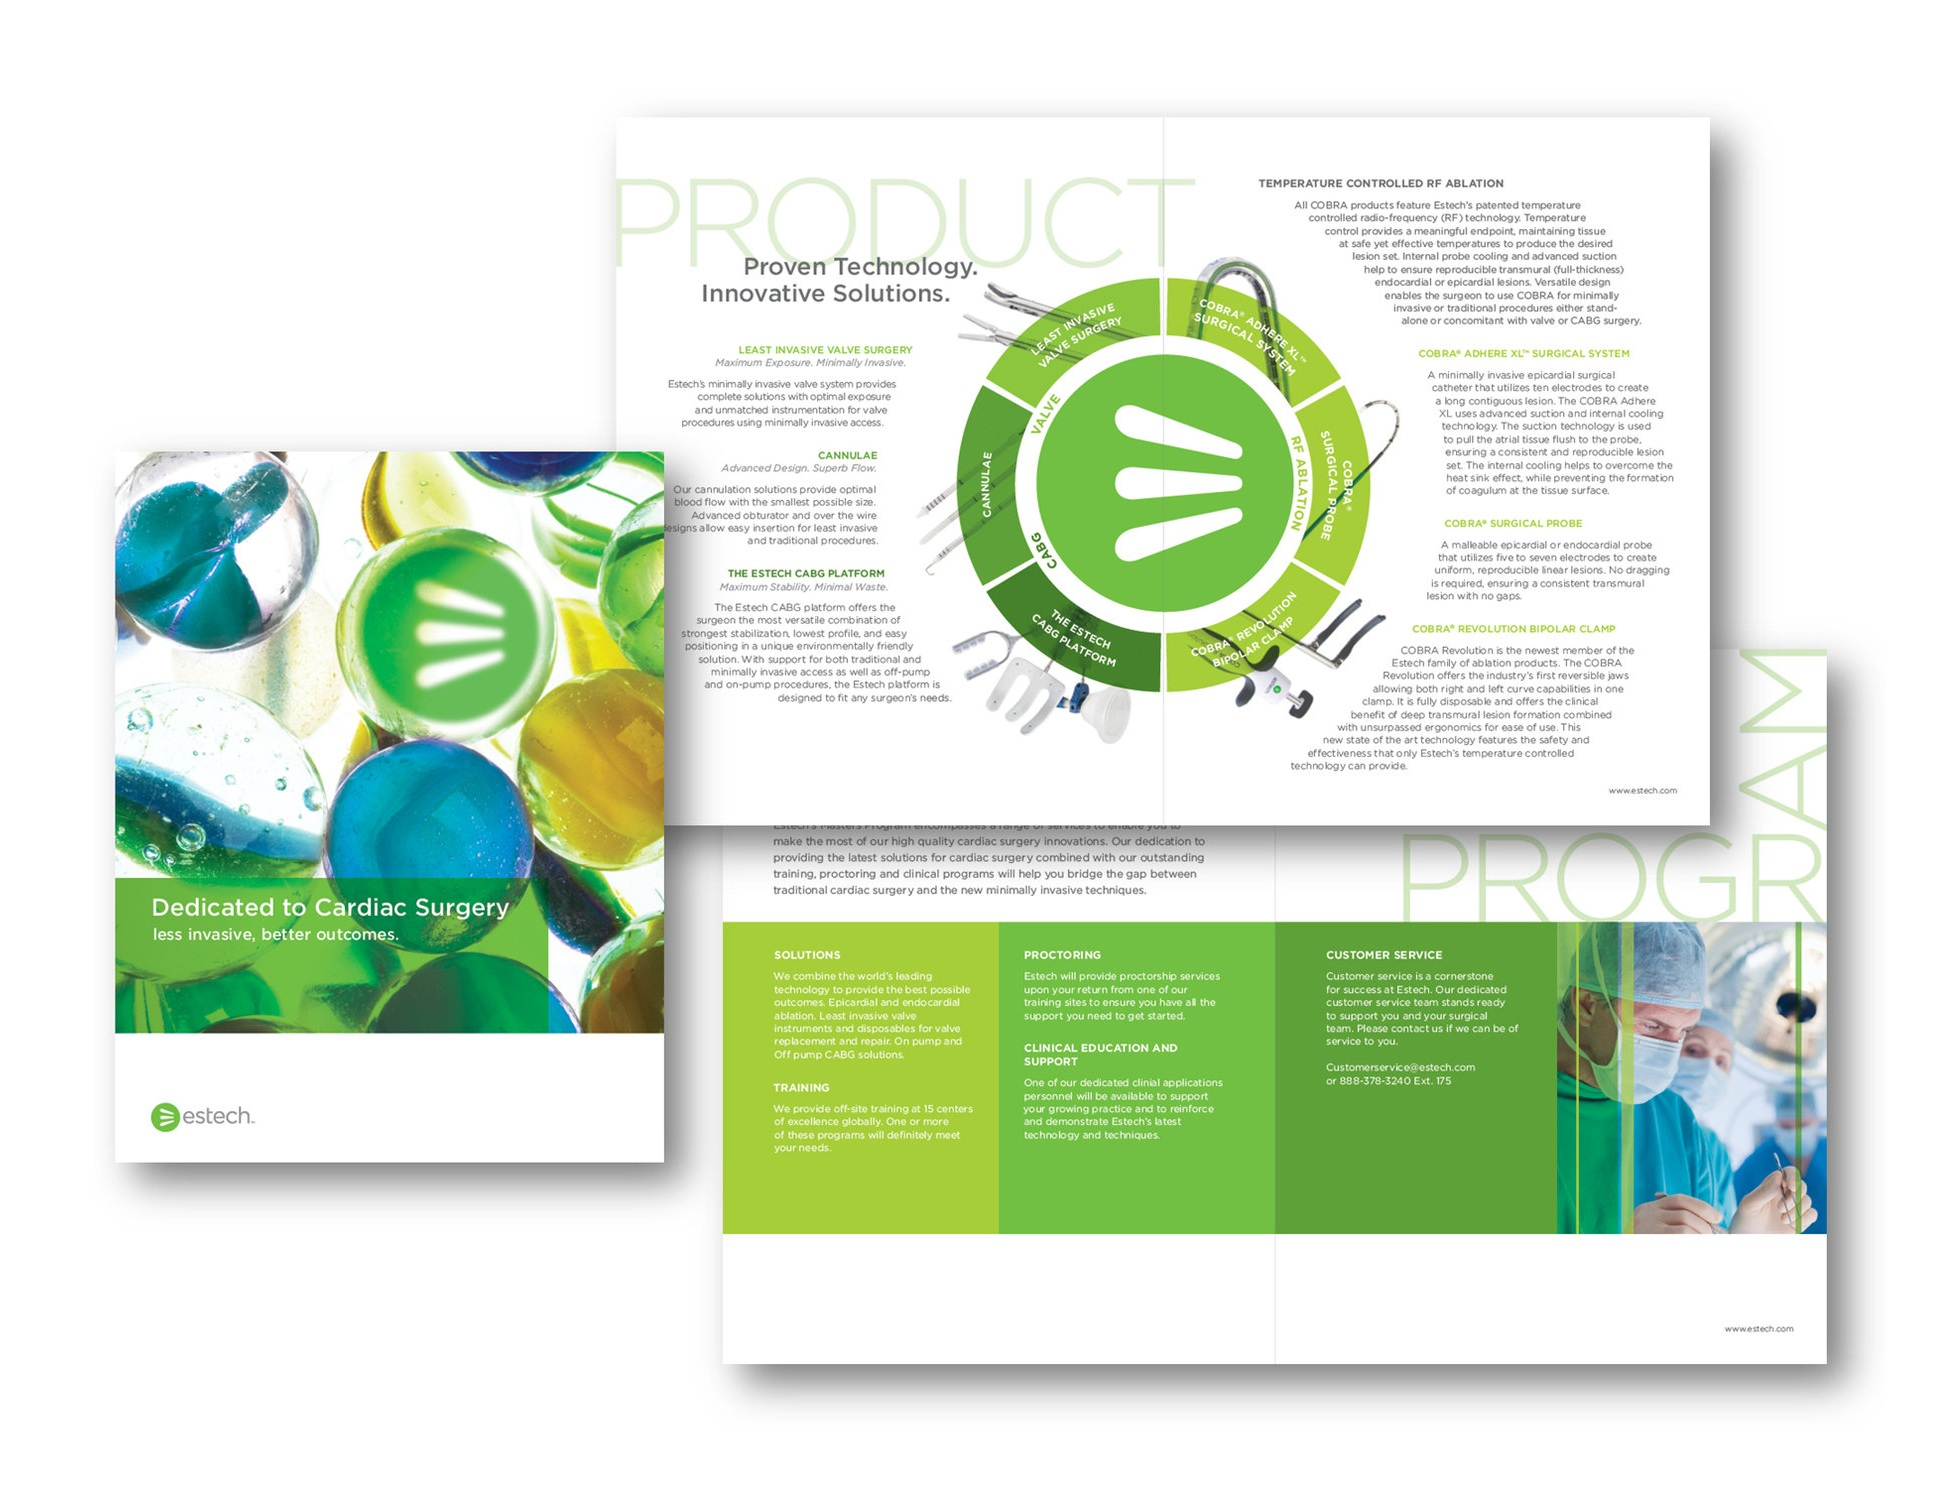 estech-brochure-2.jpg